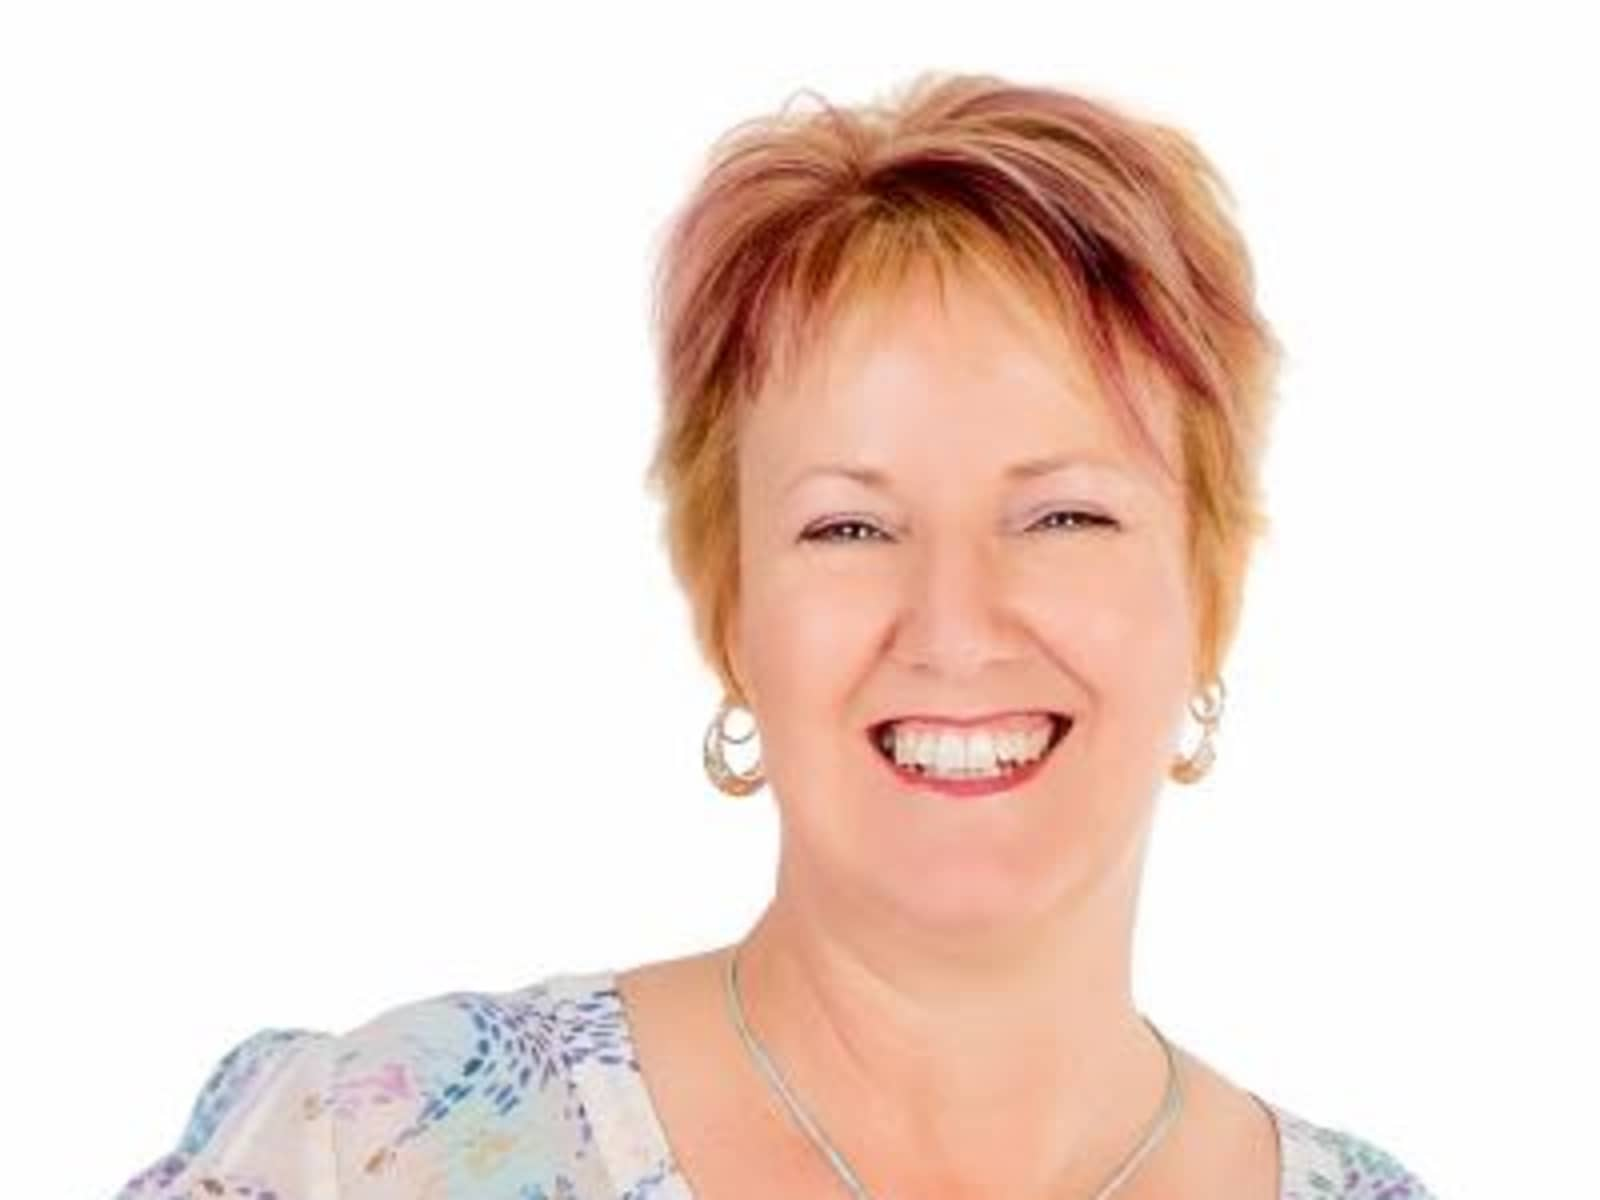 Gaye from Mandurah, Western Australia, Australia